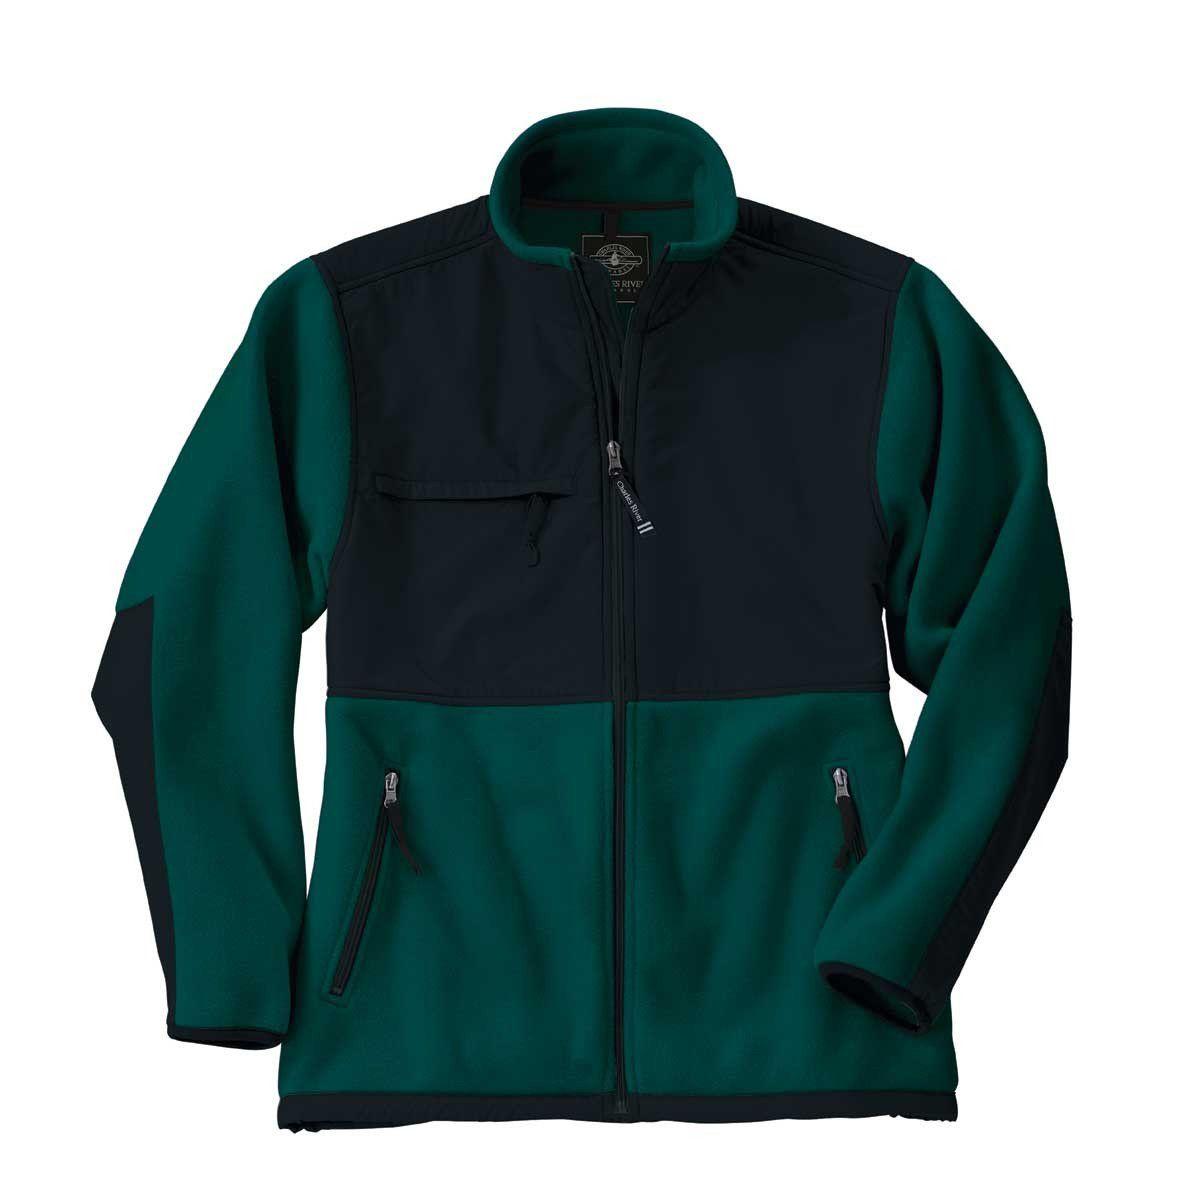 Charles river menus forestblack evolux fleece jacket in